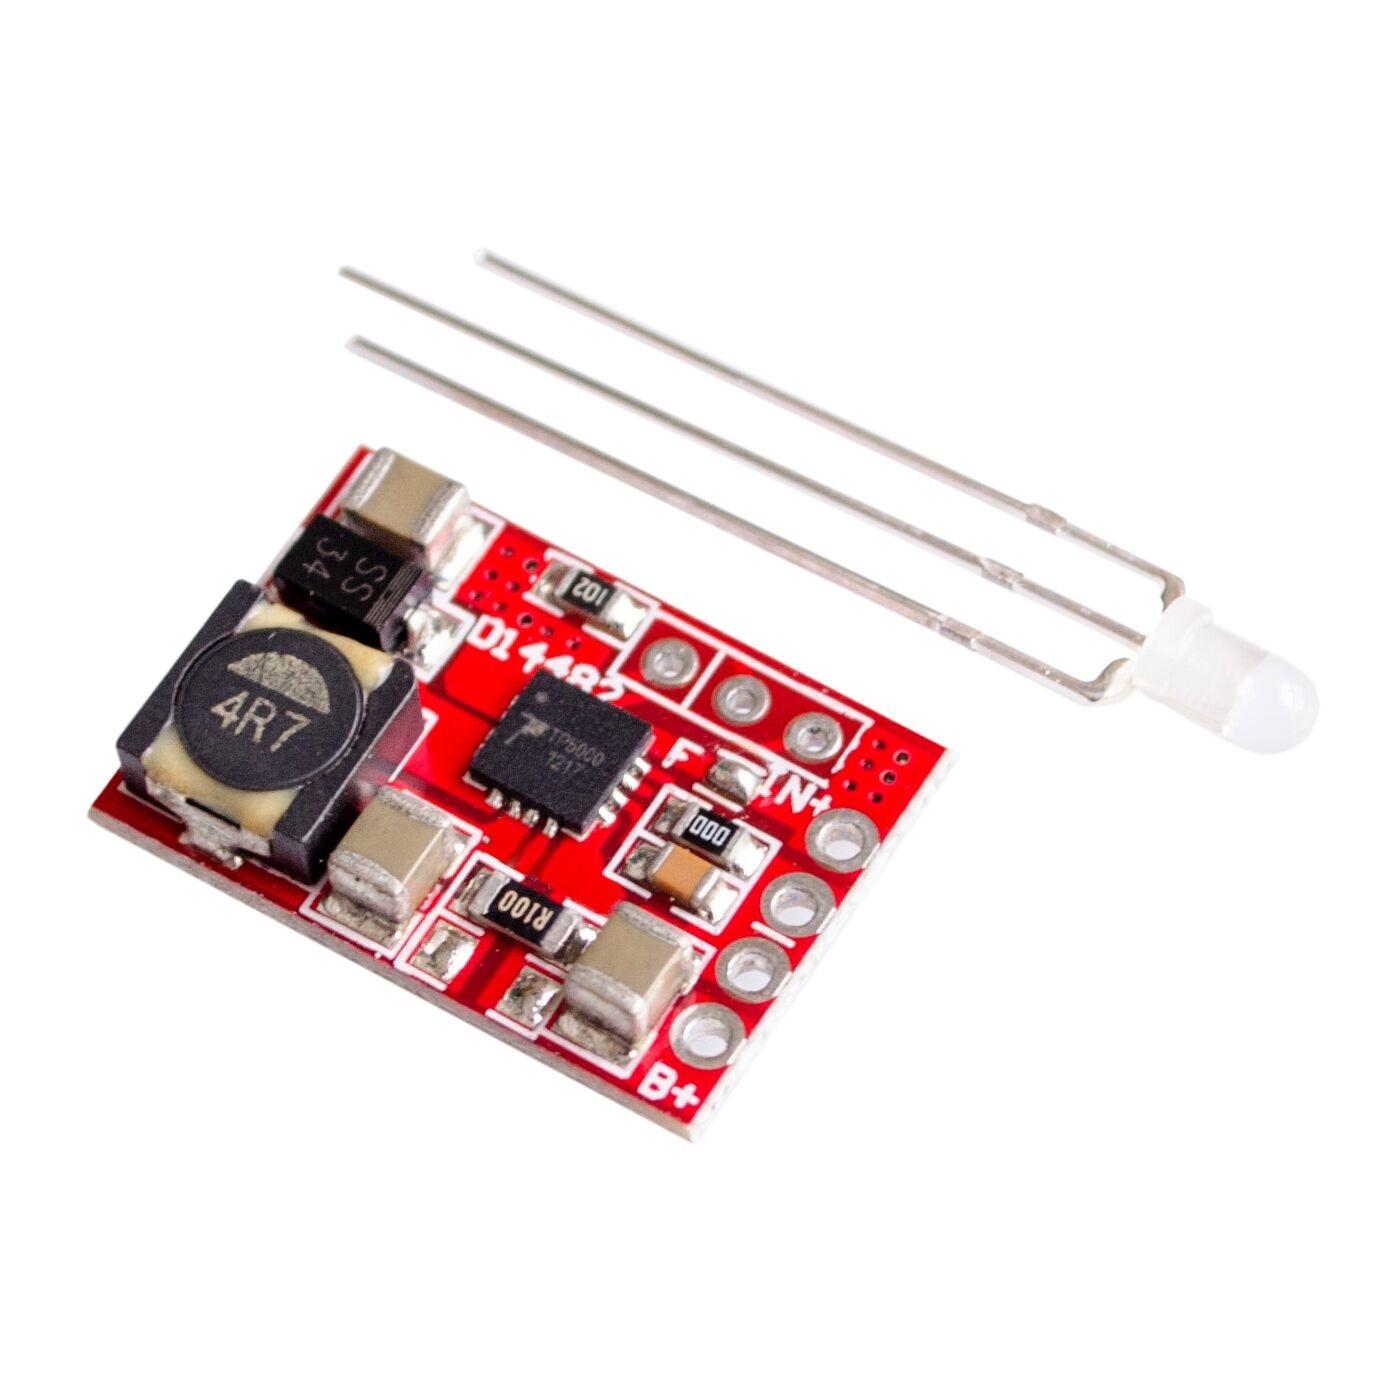 TP5000 4.2V/3.6V 1A Lithium Battery Charging Board Charger Module